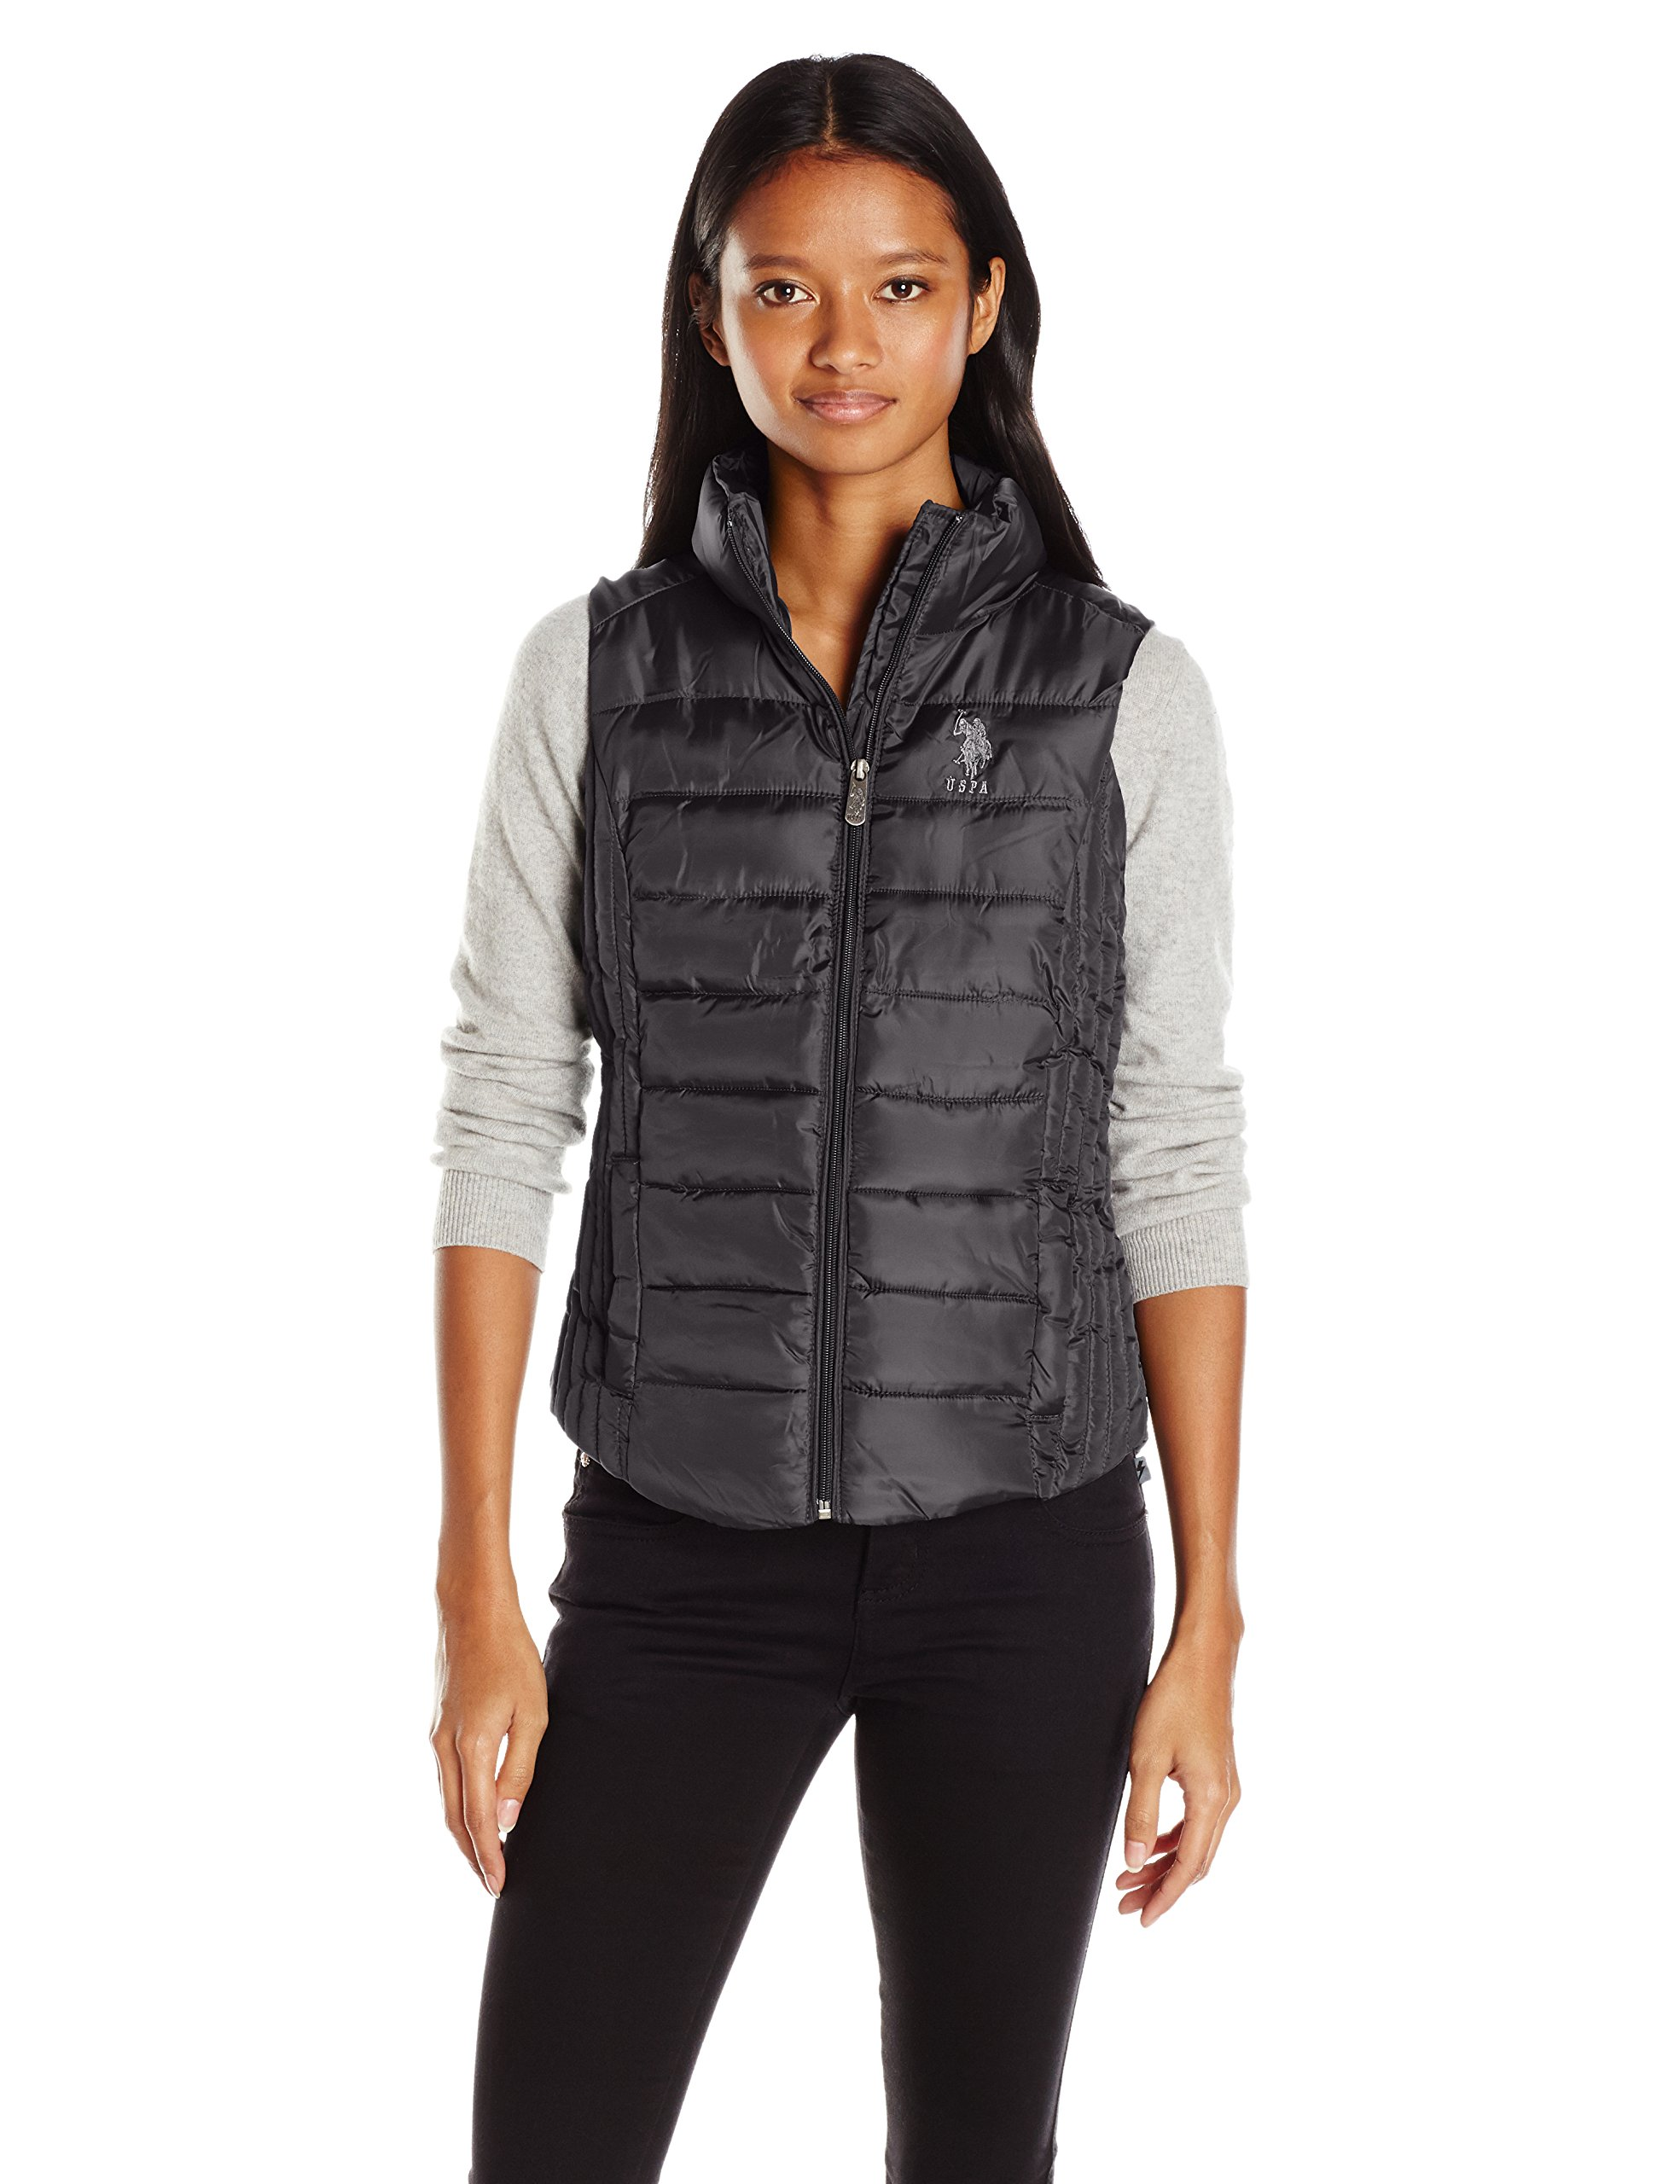 U.S. Polo Assn. Women's Puffer Vest, Black, L